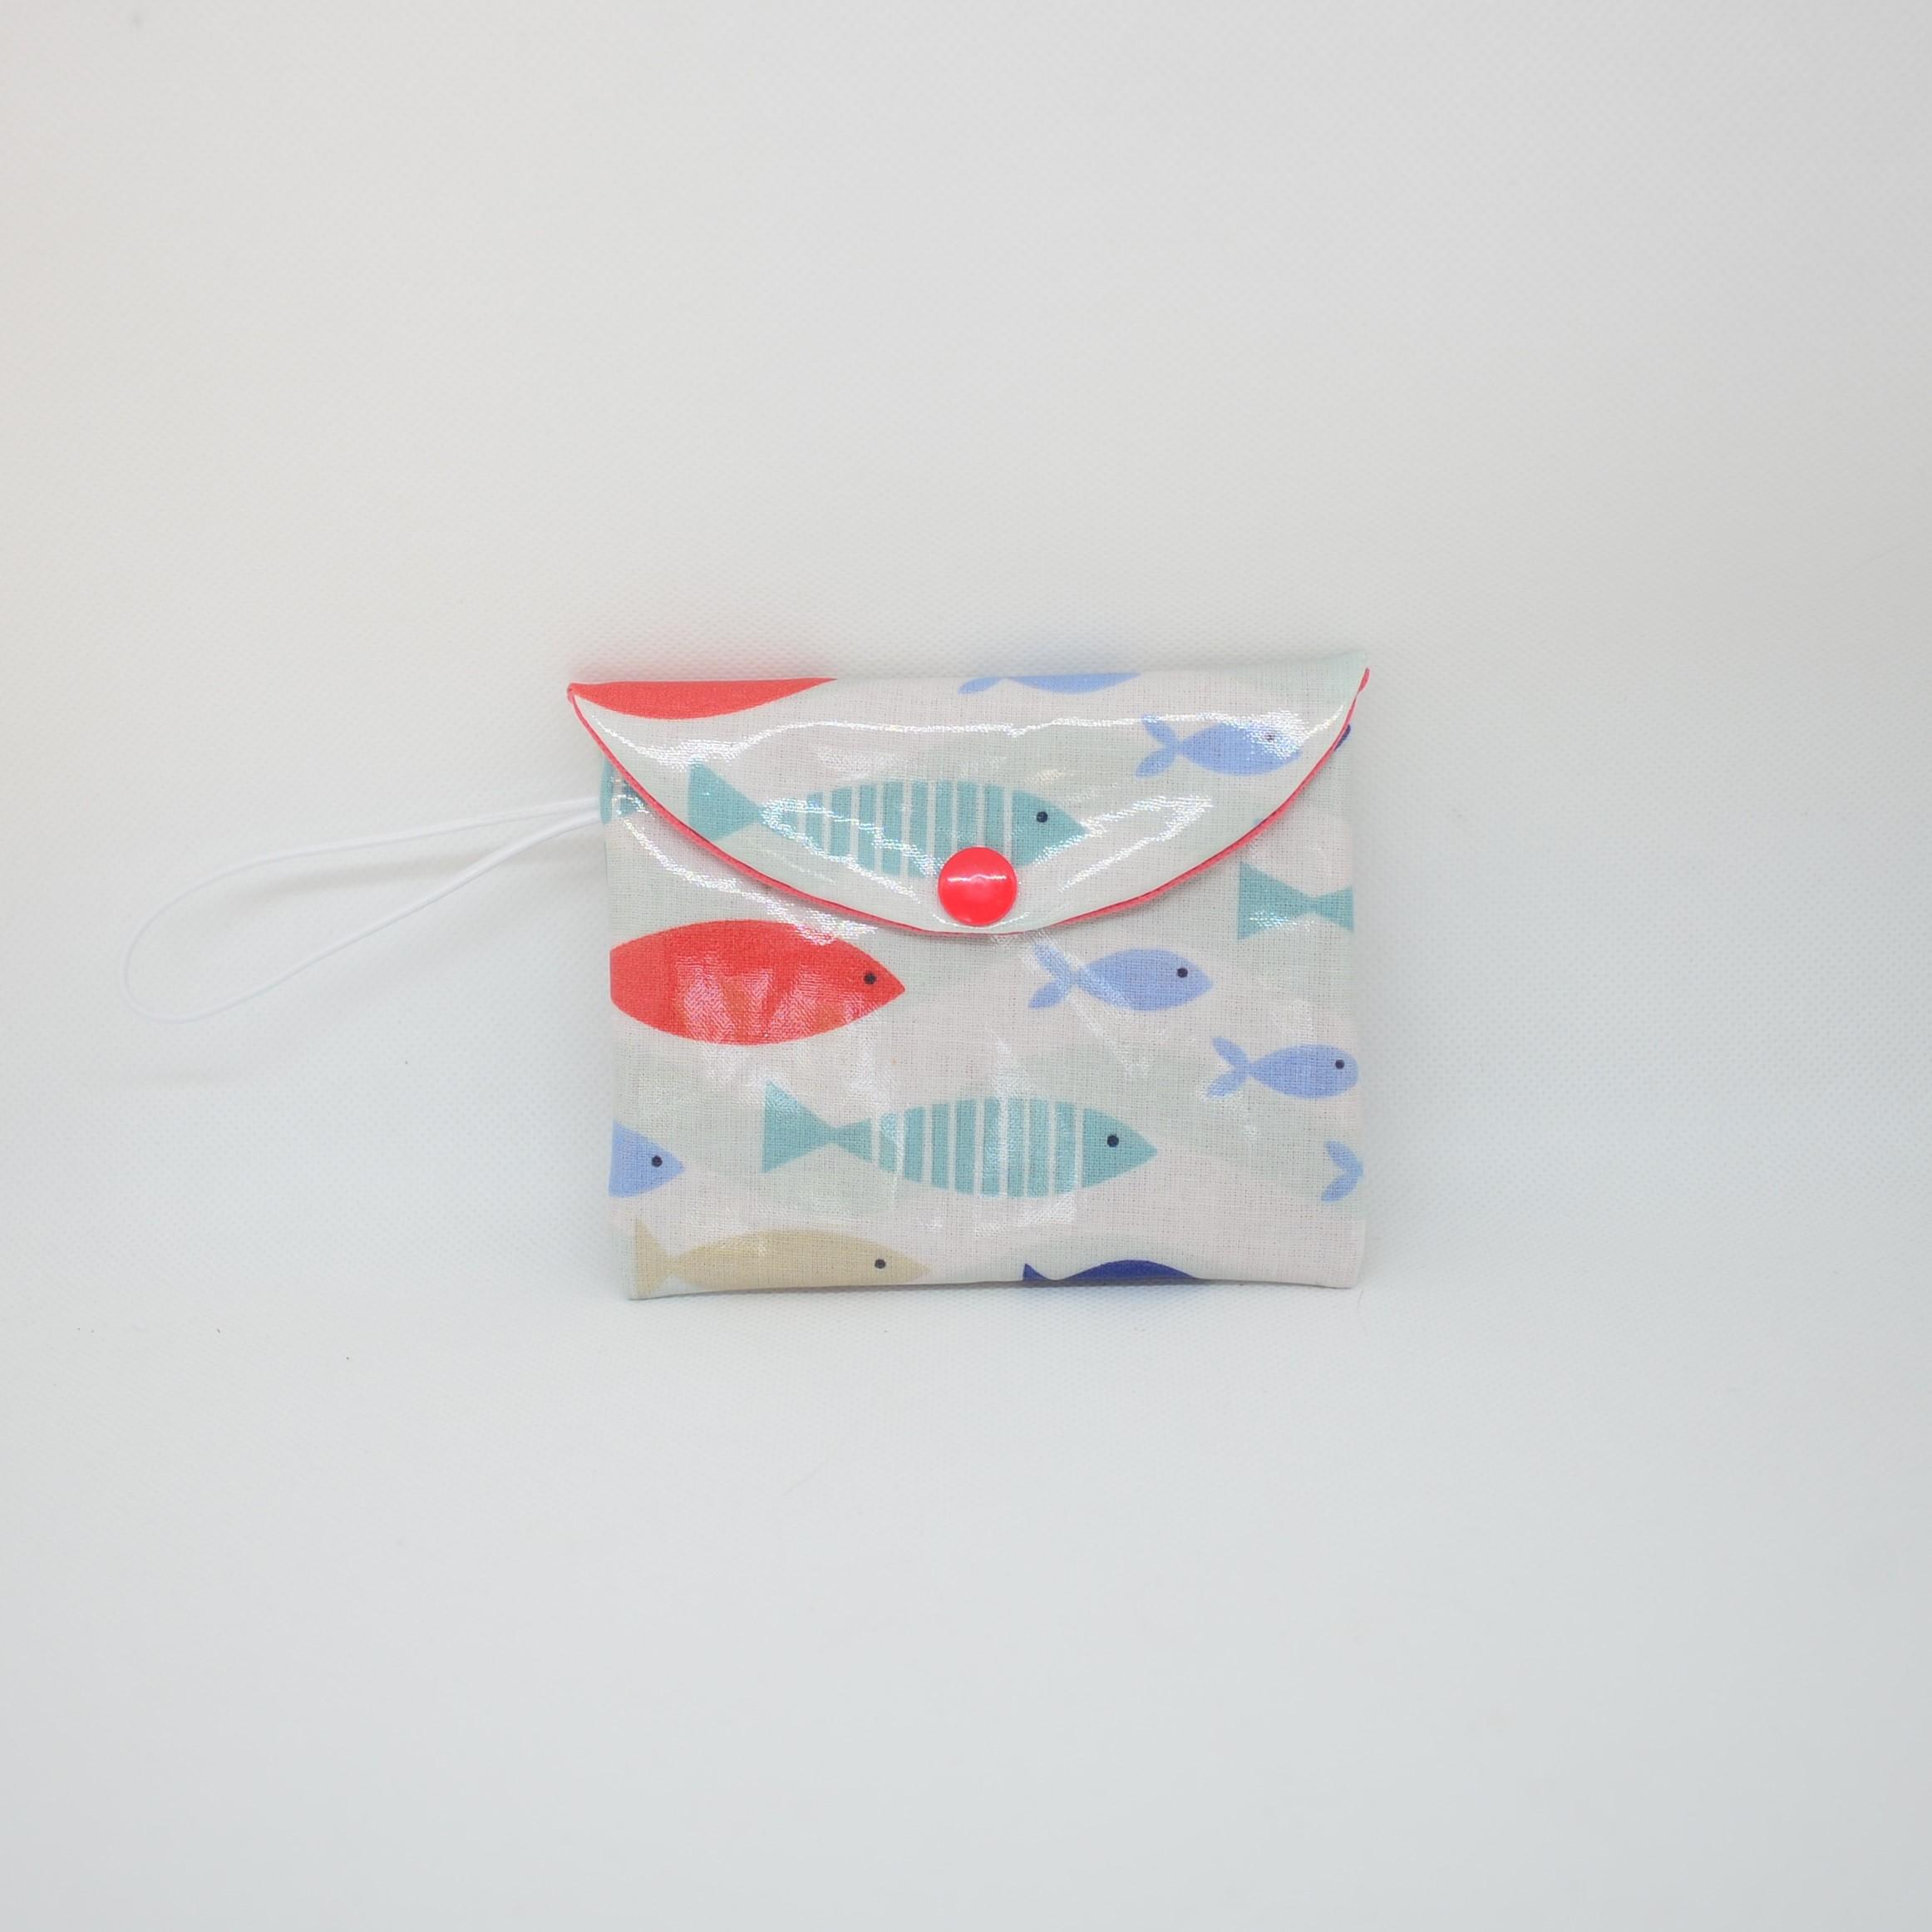 Etui imperméable  savon motif poissons--9995537142679